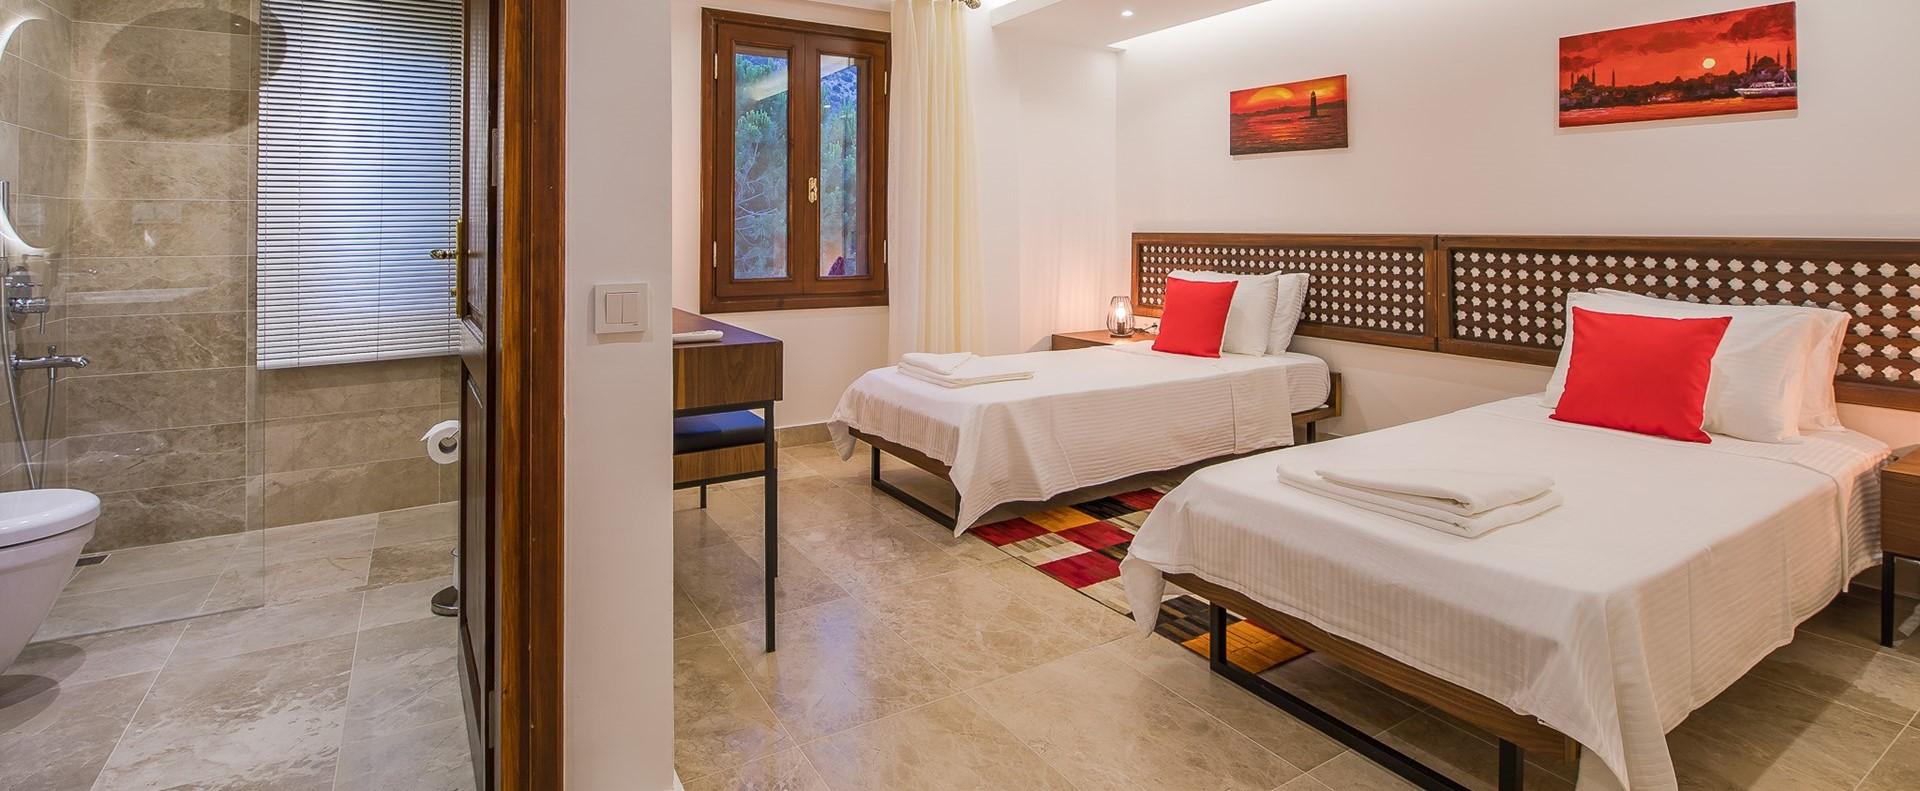 villa-caria-kalkan-twin-bedroom-2